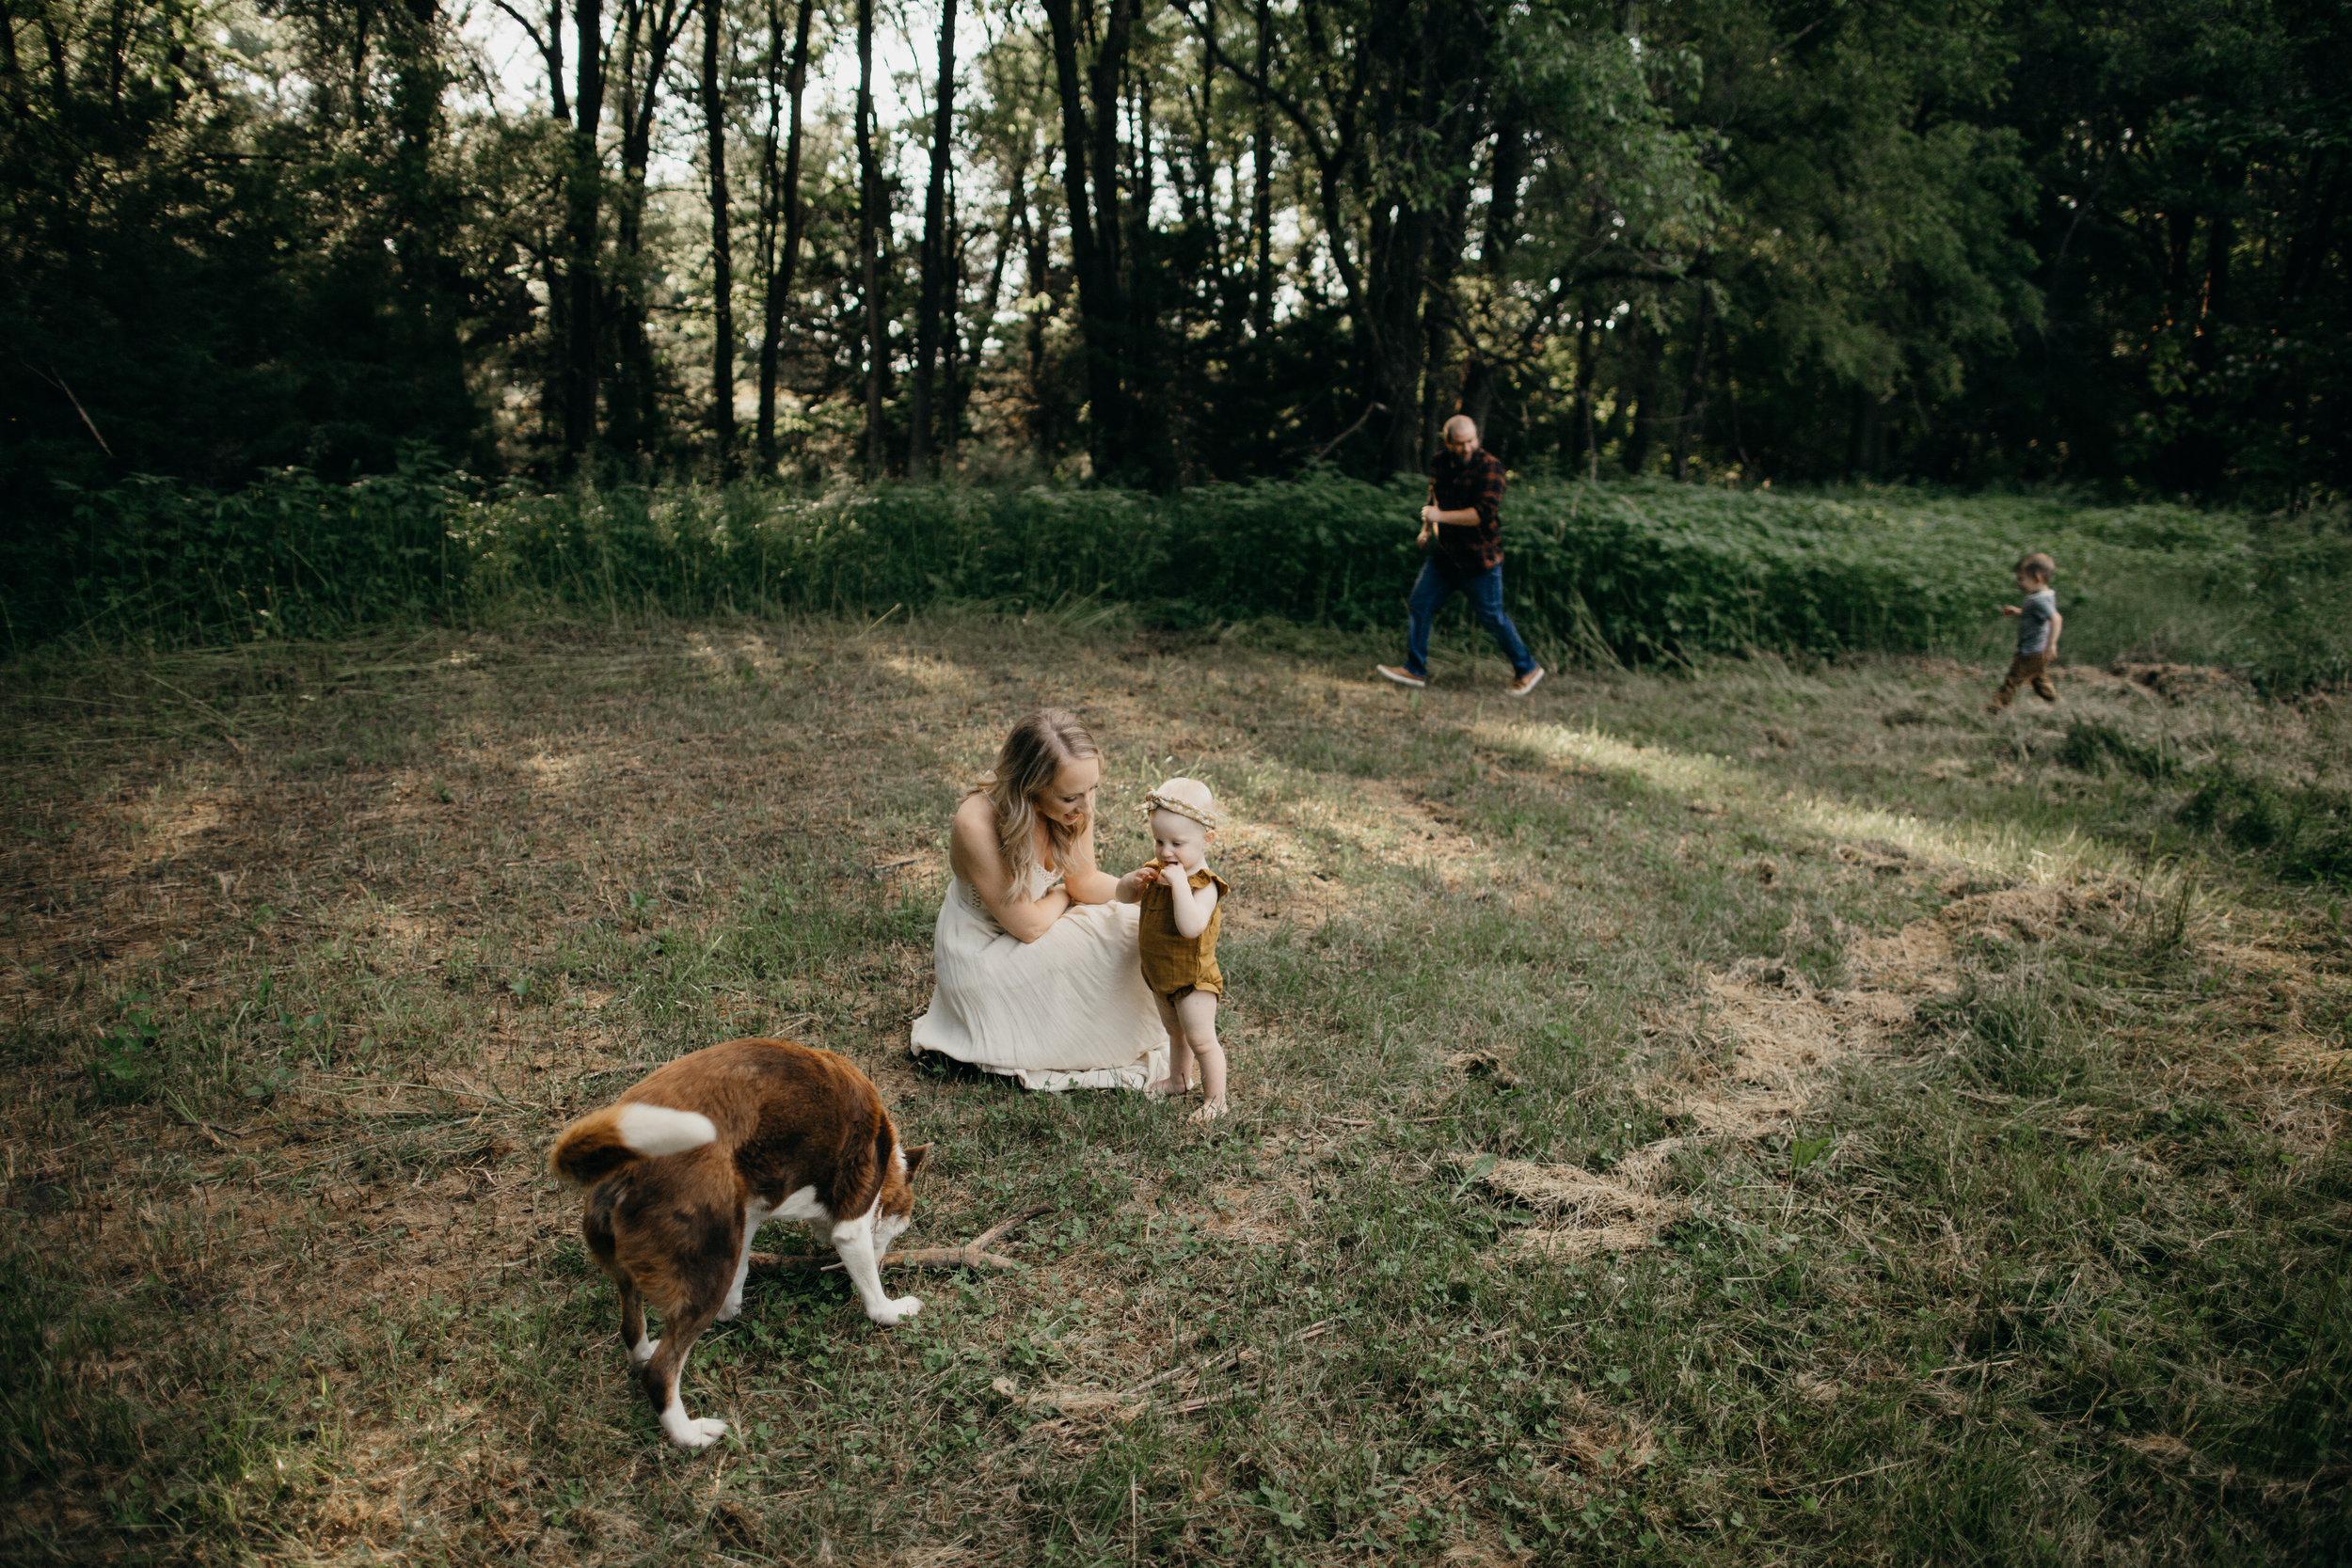 jamieleighmiller_omaha_nebraska_family_photographer-9.jpg